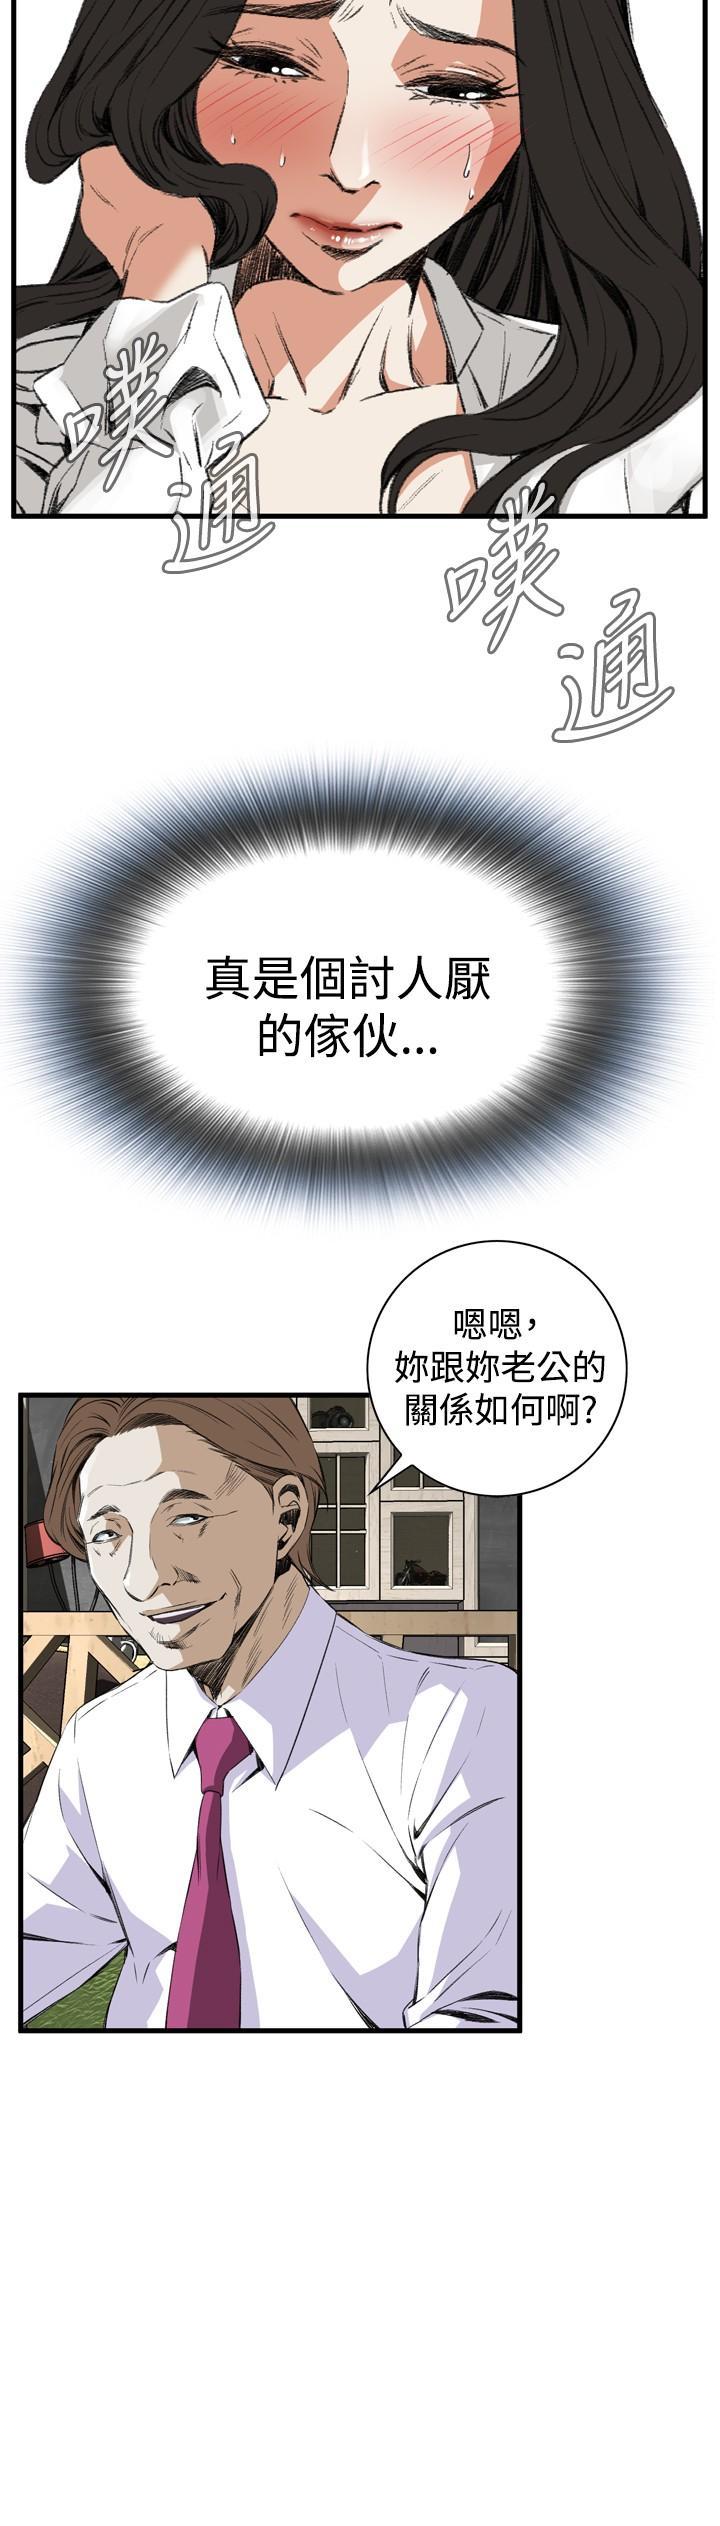 Take a Peek 偷窥 Ch.39~55 [Chinese]中文 263